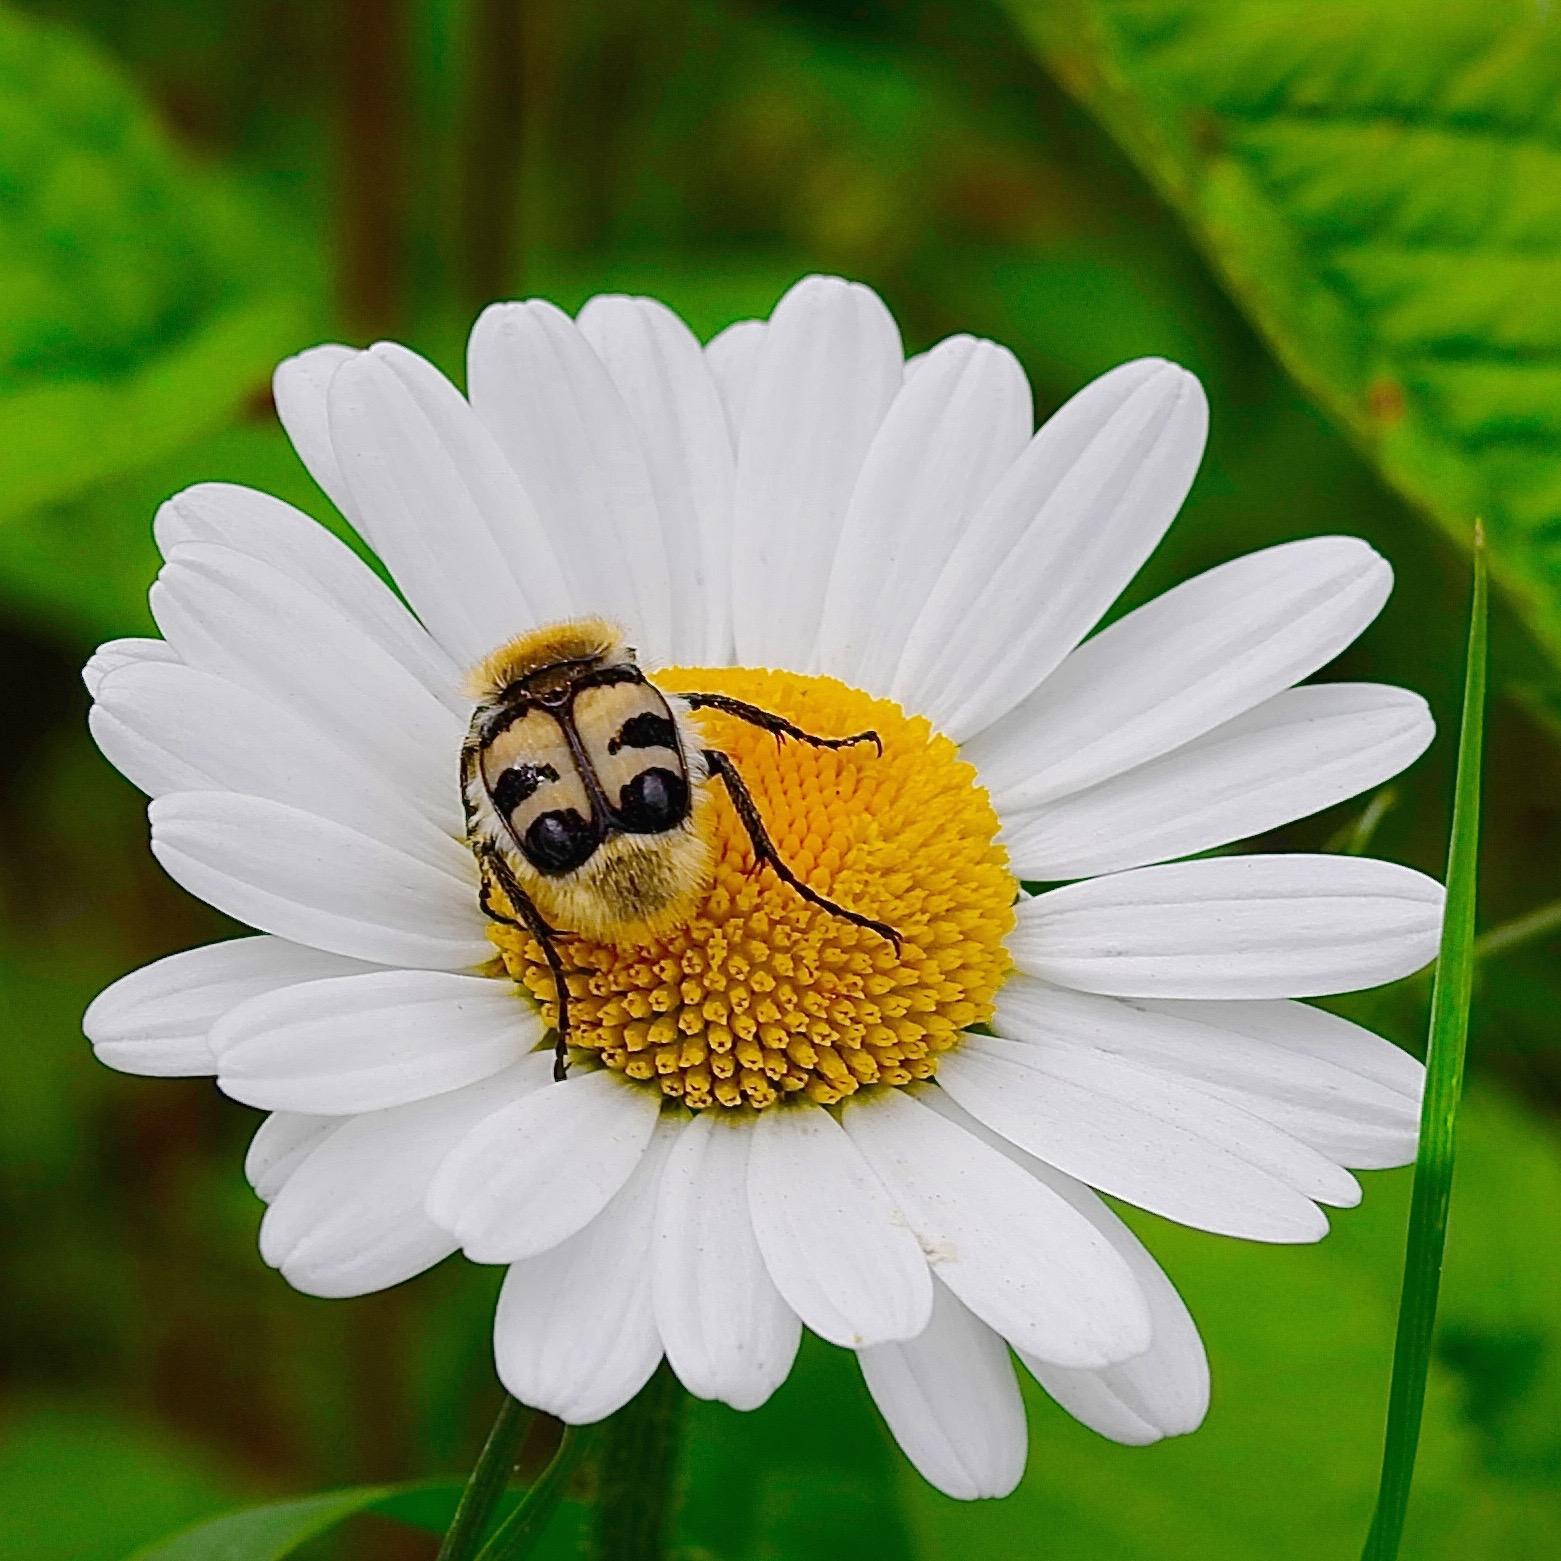 2015_05_29-Blume-mit-Kaefer_gross.jpg